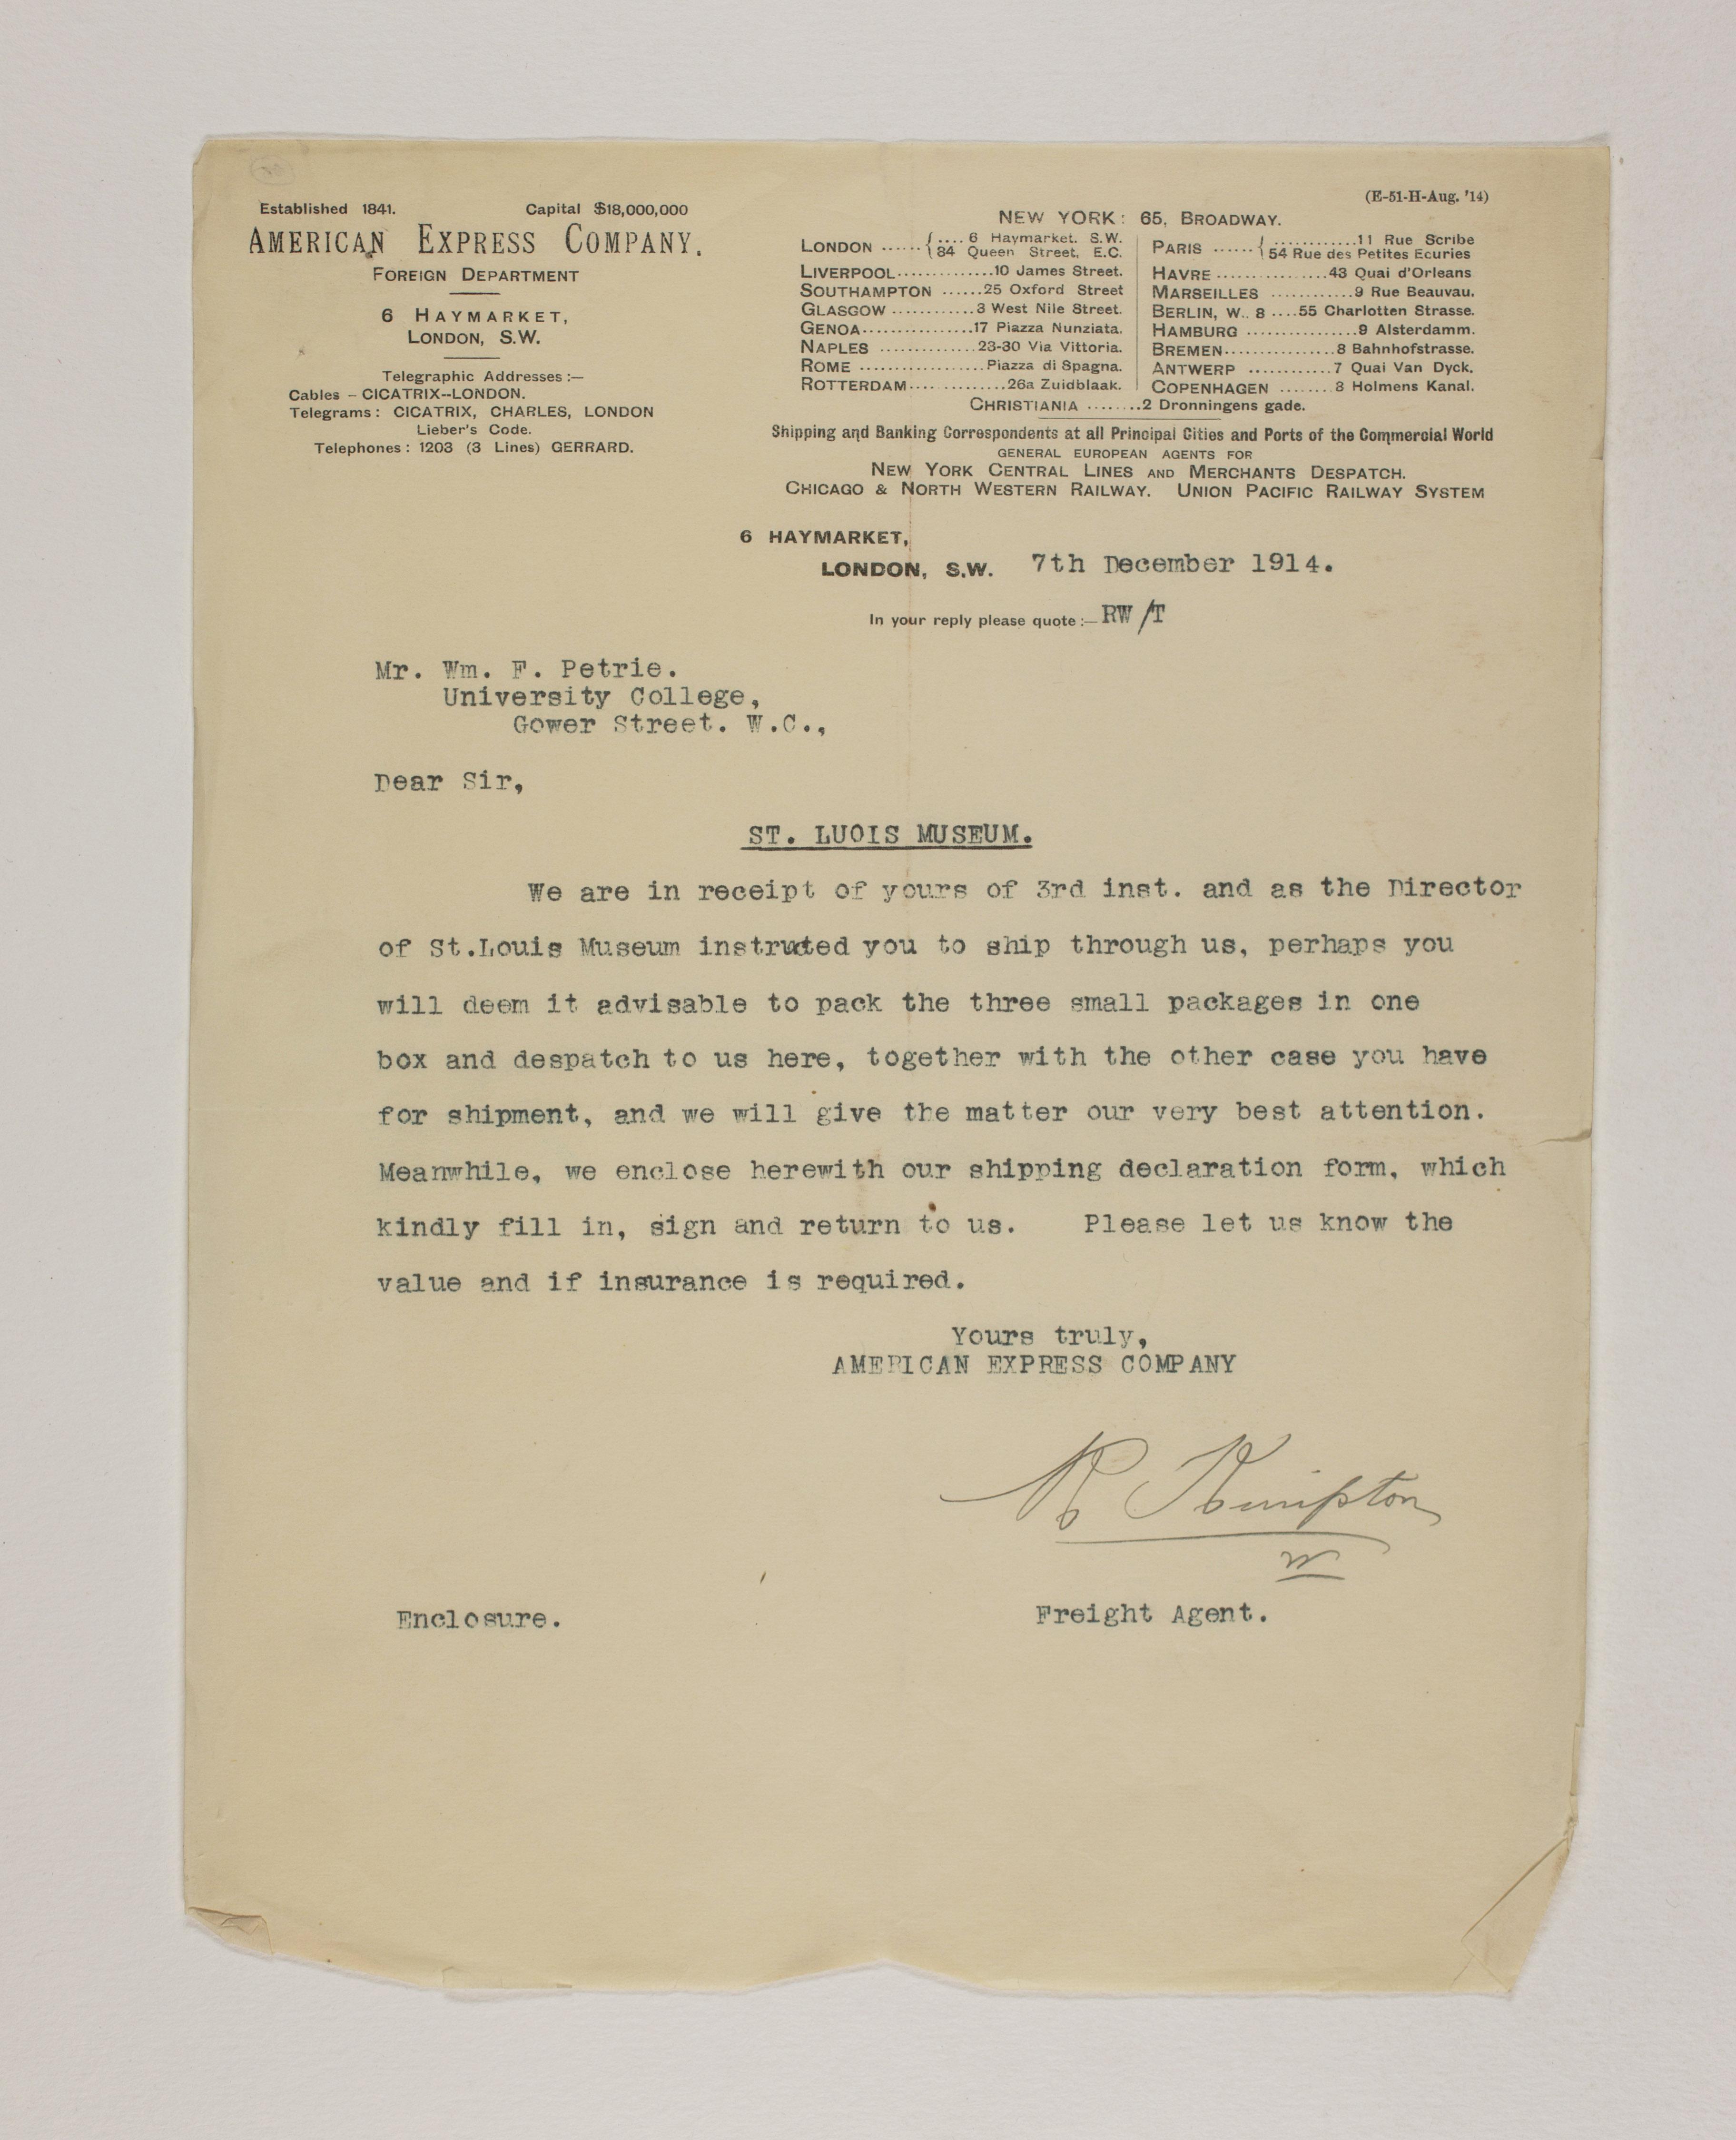 1913-14 Lahun, Haraga Mailing label PMA/WFP1/D/22/68